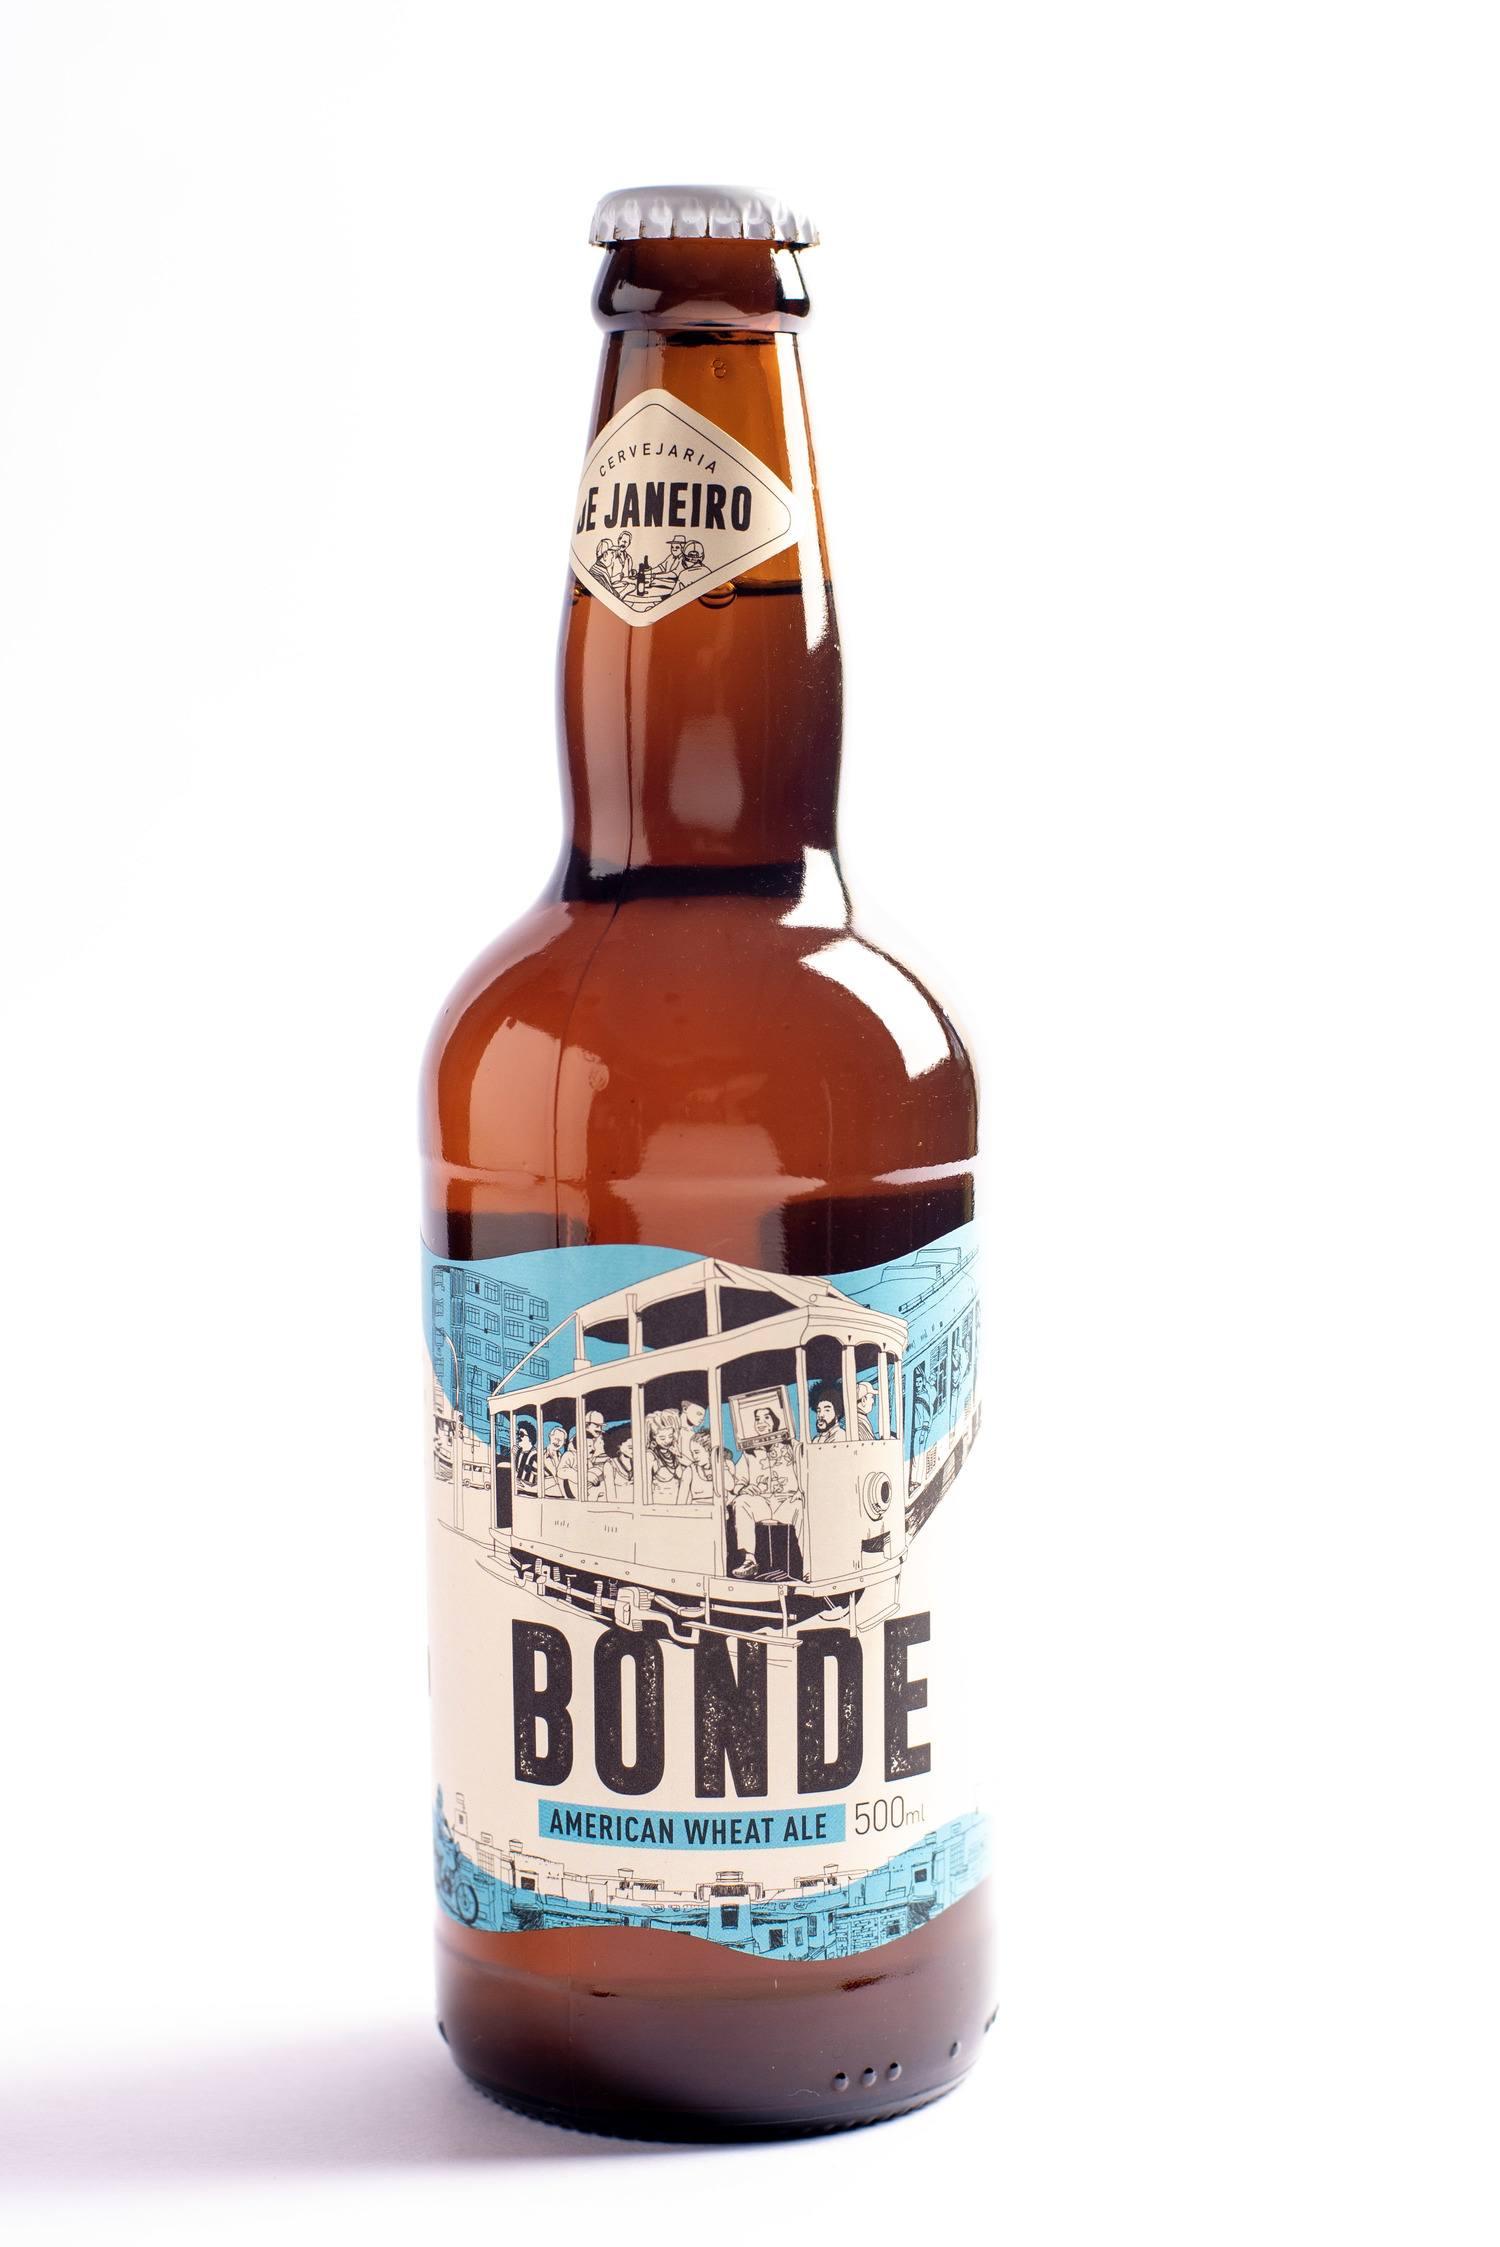 Cerveja Bonde - American Wheat Ale - De Janeiro